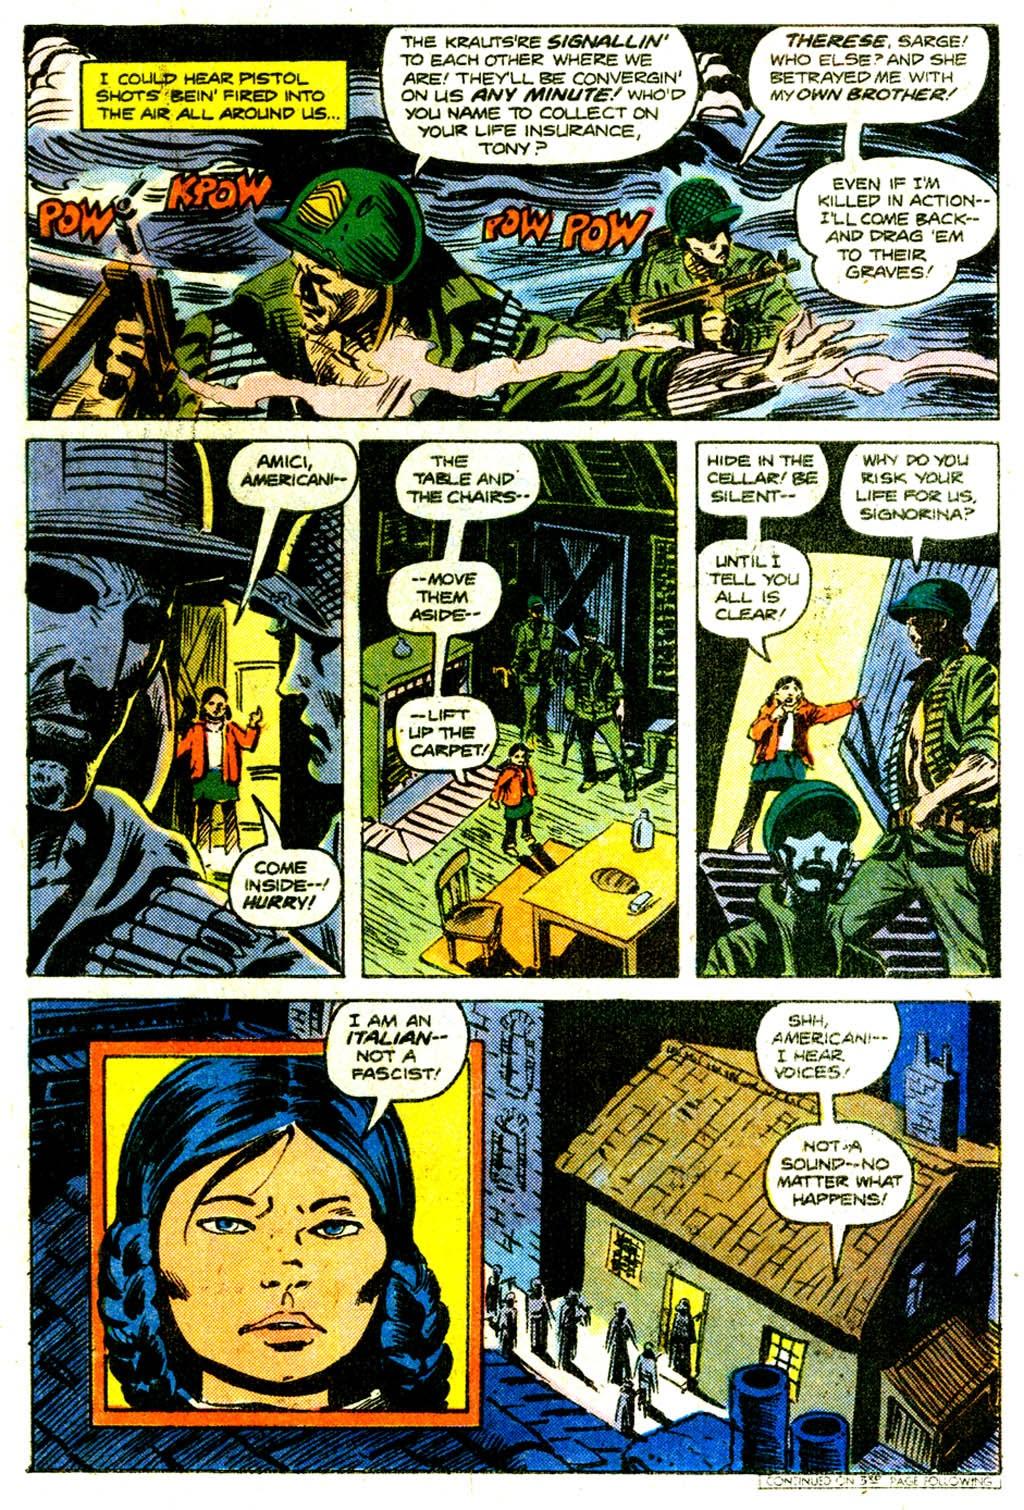 Read online Sgt. Rock comic -  Issue #303 - 5